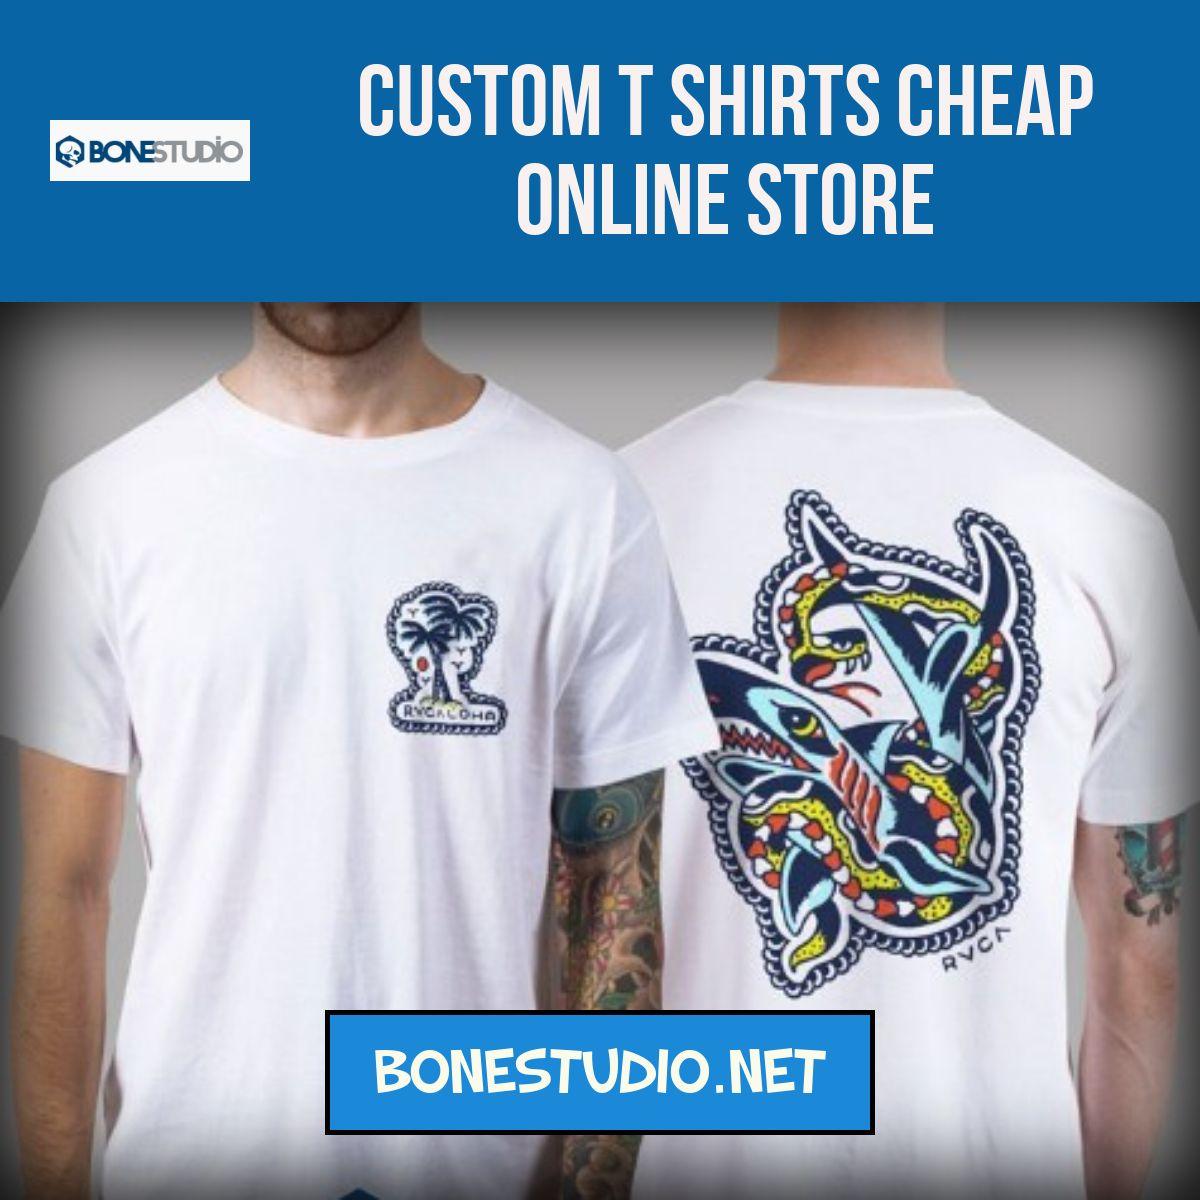 ART4GALLERY – Art Galery for t shirt designs,sweatshirts